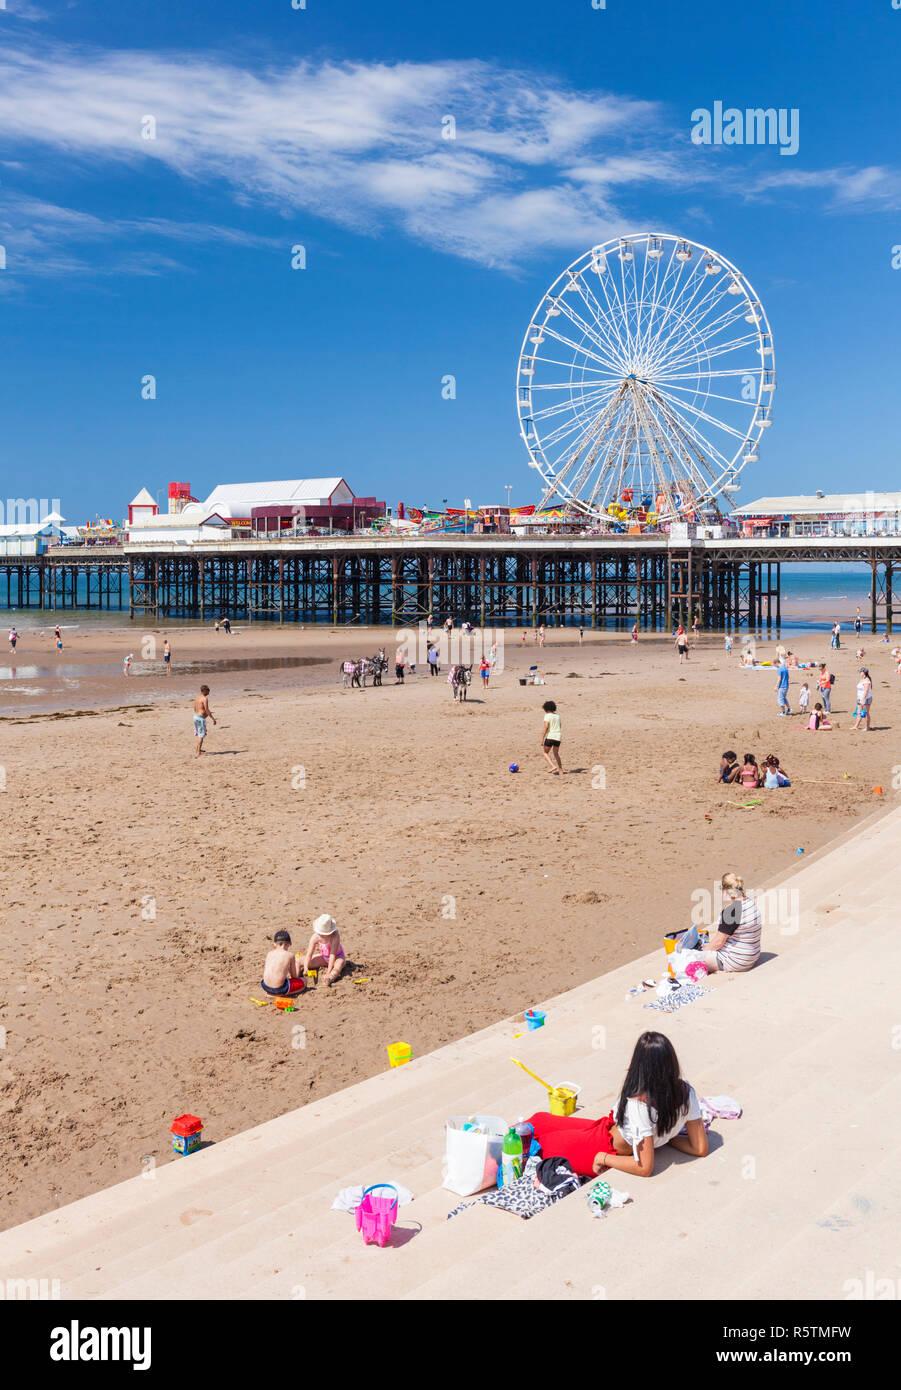 Blackpool beach summer ferris wheel on Blackpool central pier Blackpool Lots of people on the sandy beach at Blackpool Lancashire England UK GB Europe - Stock Image